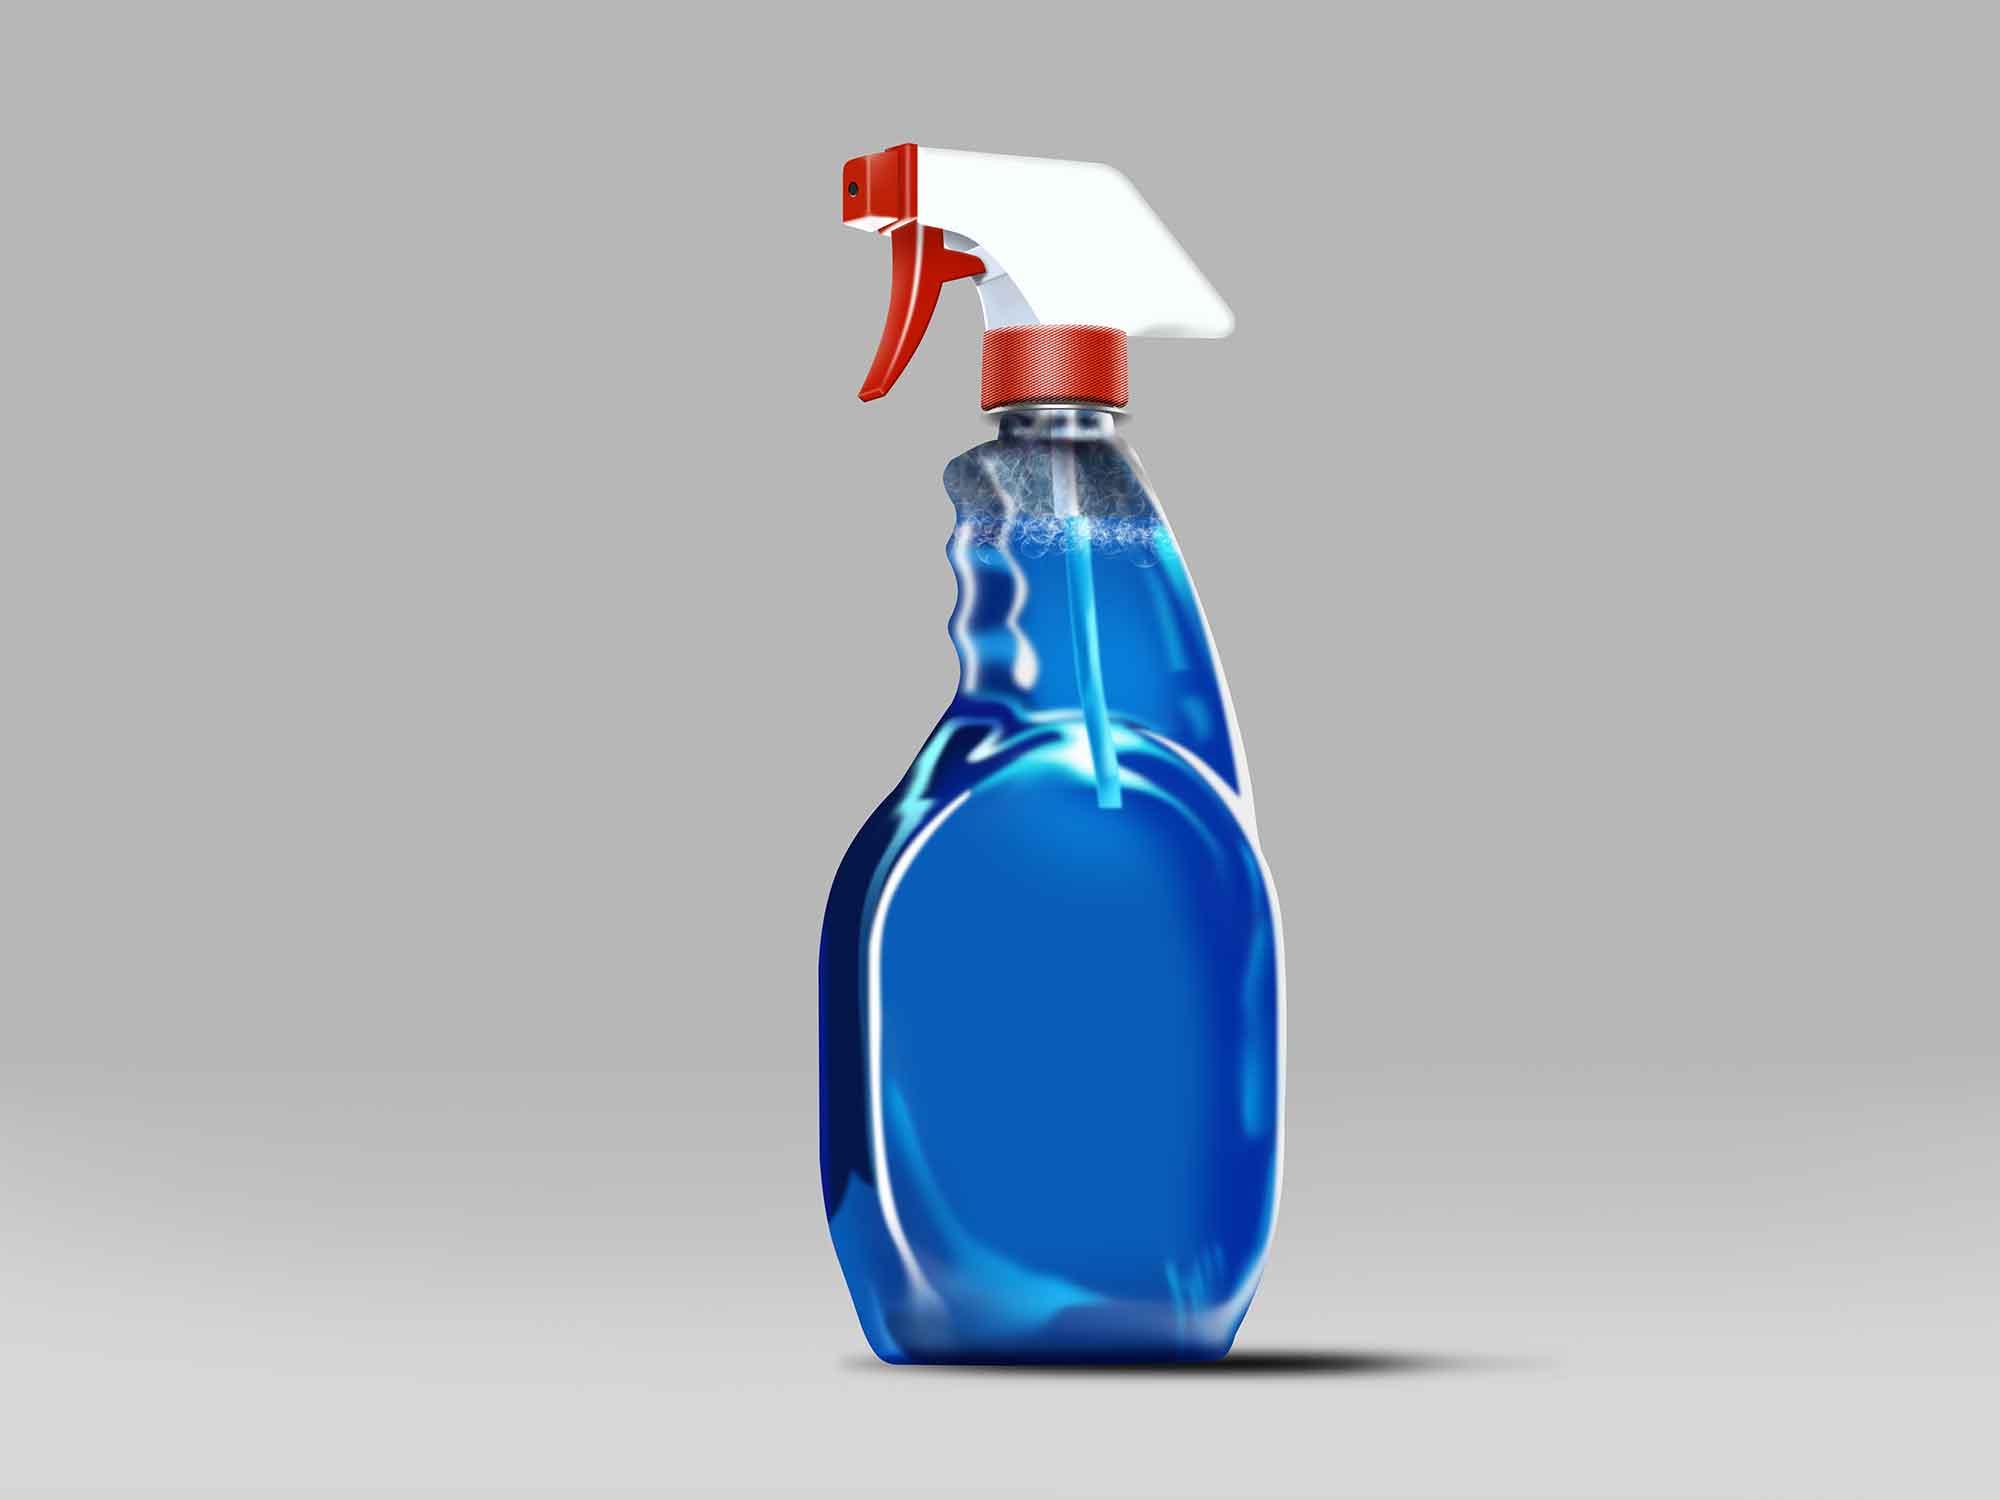 Glass Cleaner Spray Mockup 2